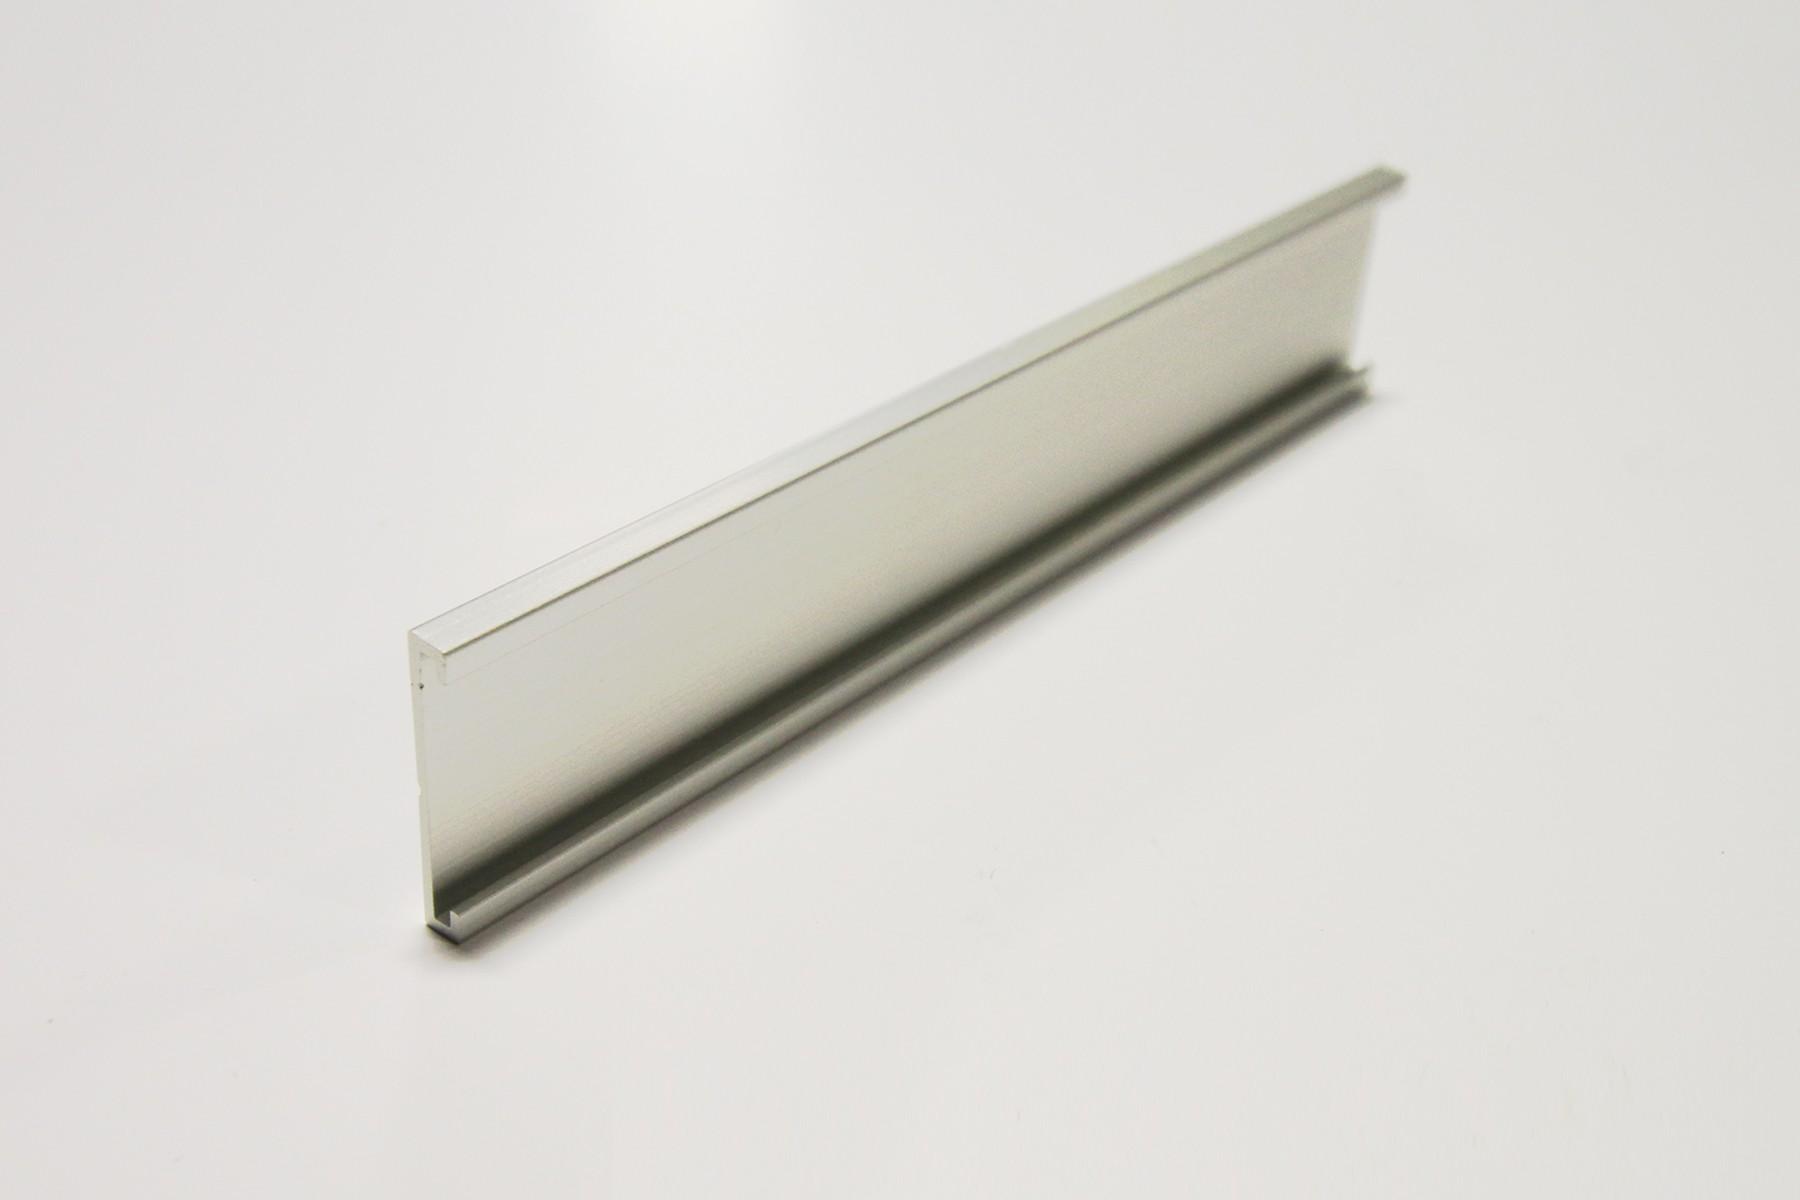 1 x 36 Wall Holder, Stn Silver